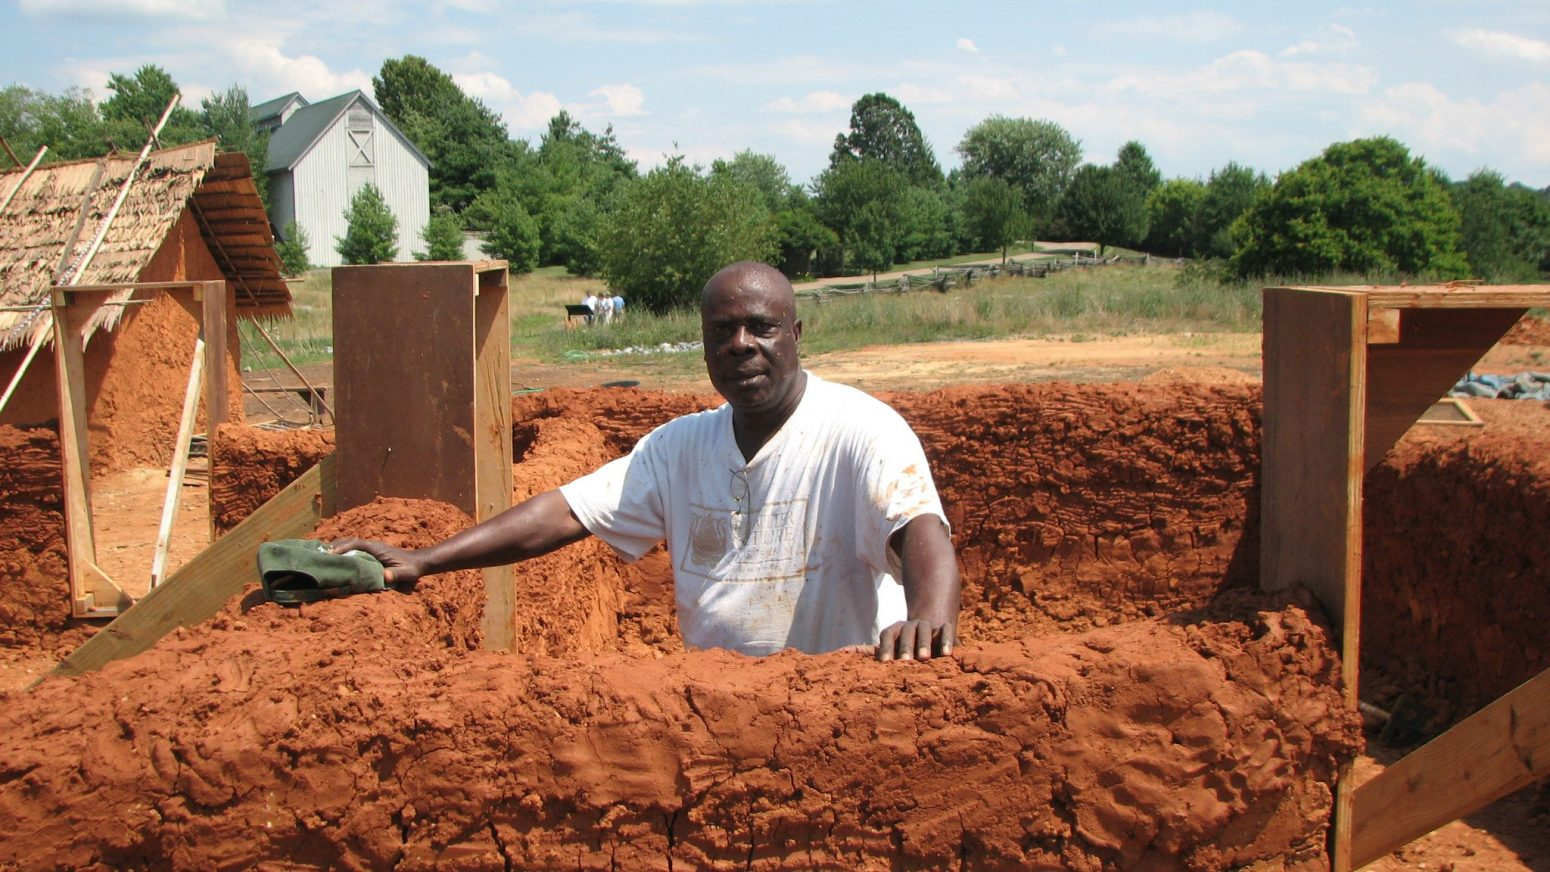 USAfrica: Igbo Farm Village in America marks 1st anniversary; Q&A wt Prof.  Akuma-Kalu Njoku